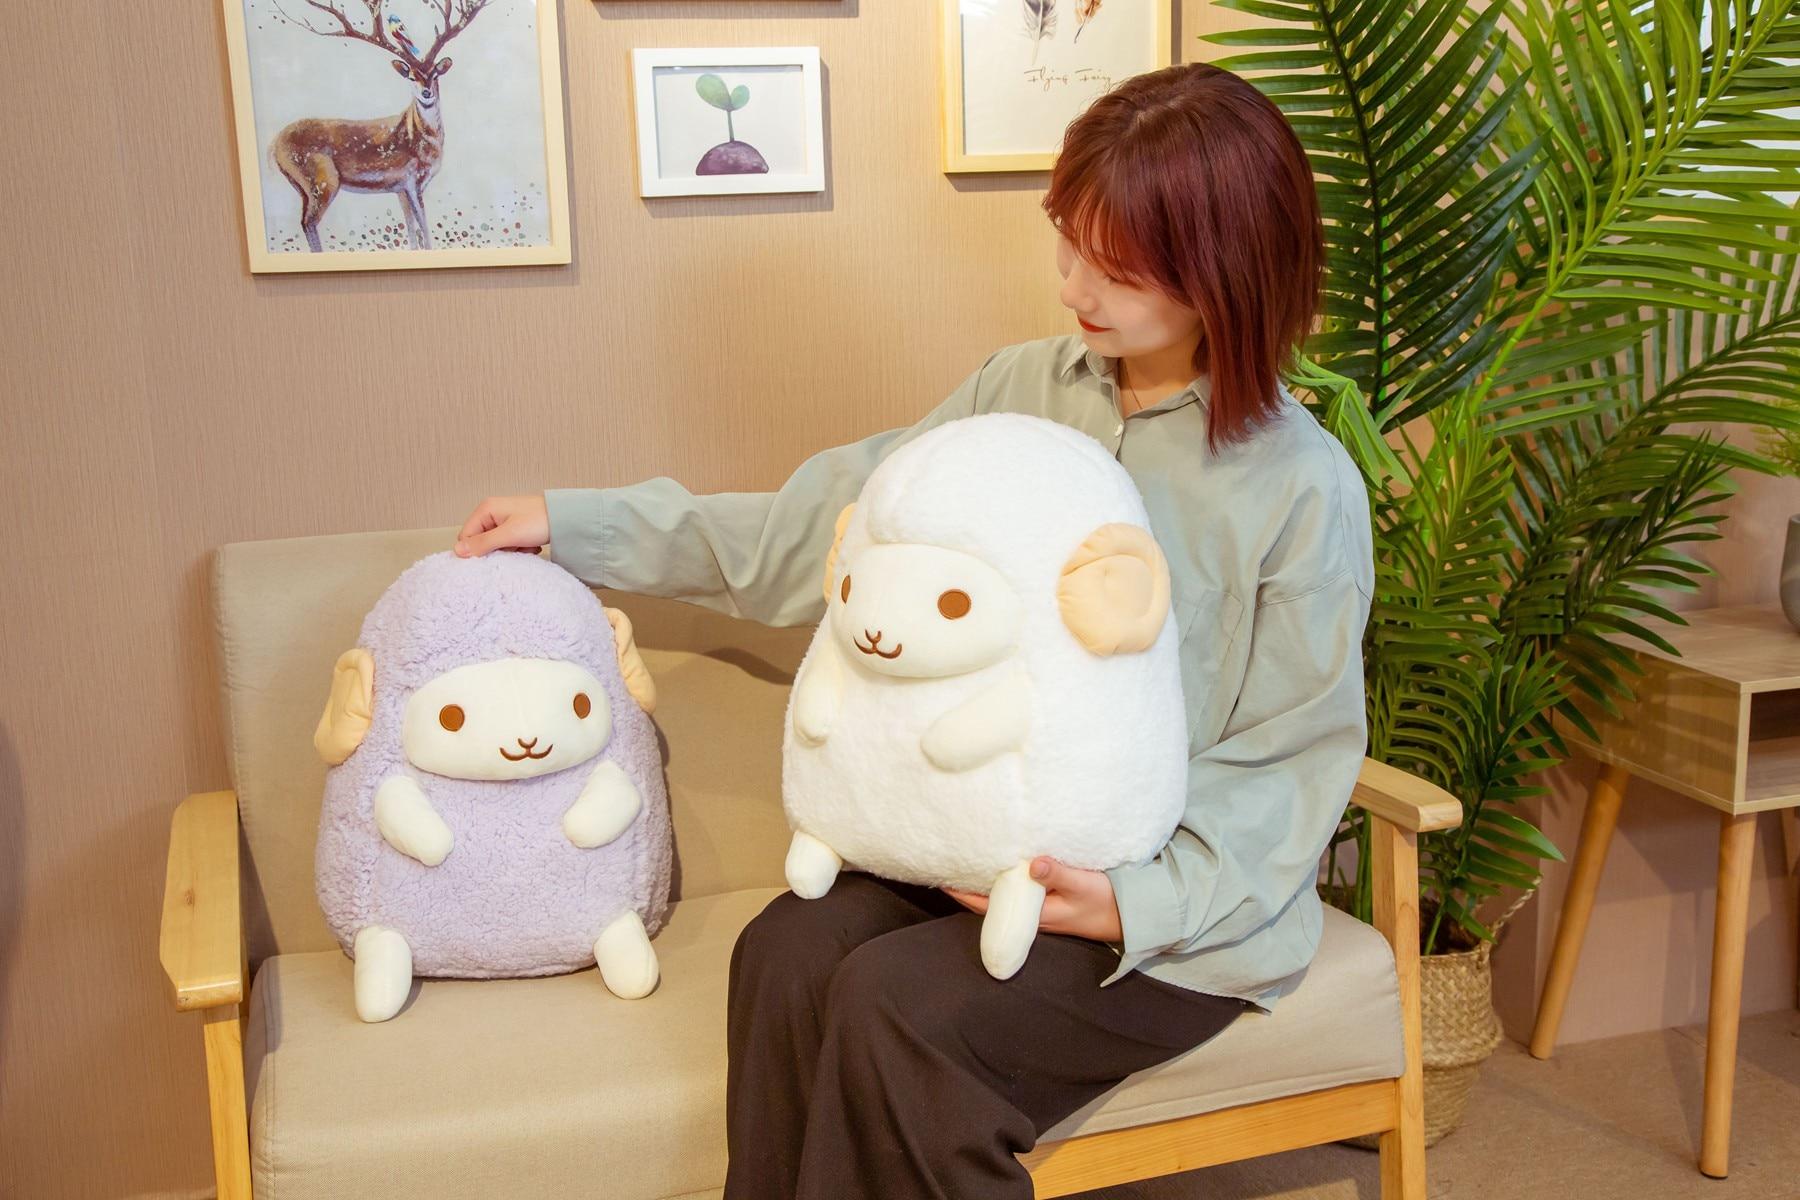 Lovely Dreamful Angel Sheep Plush Toys Stuffed Animal Lamb Doll Soft Pillow Baby Kids Girls Kawaii Birthday Gift Room Decoration